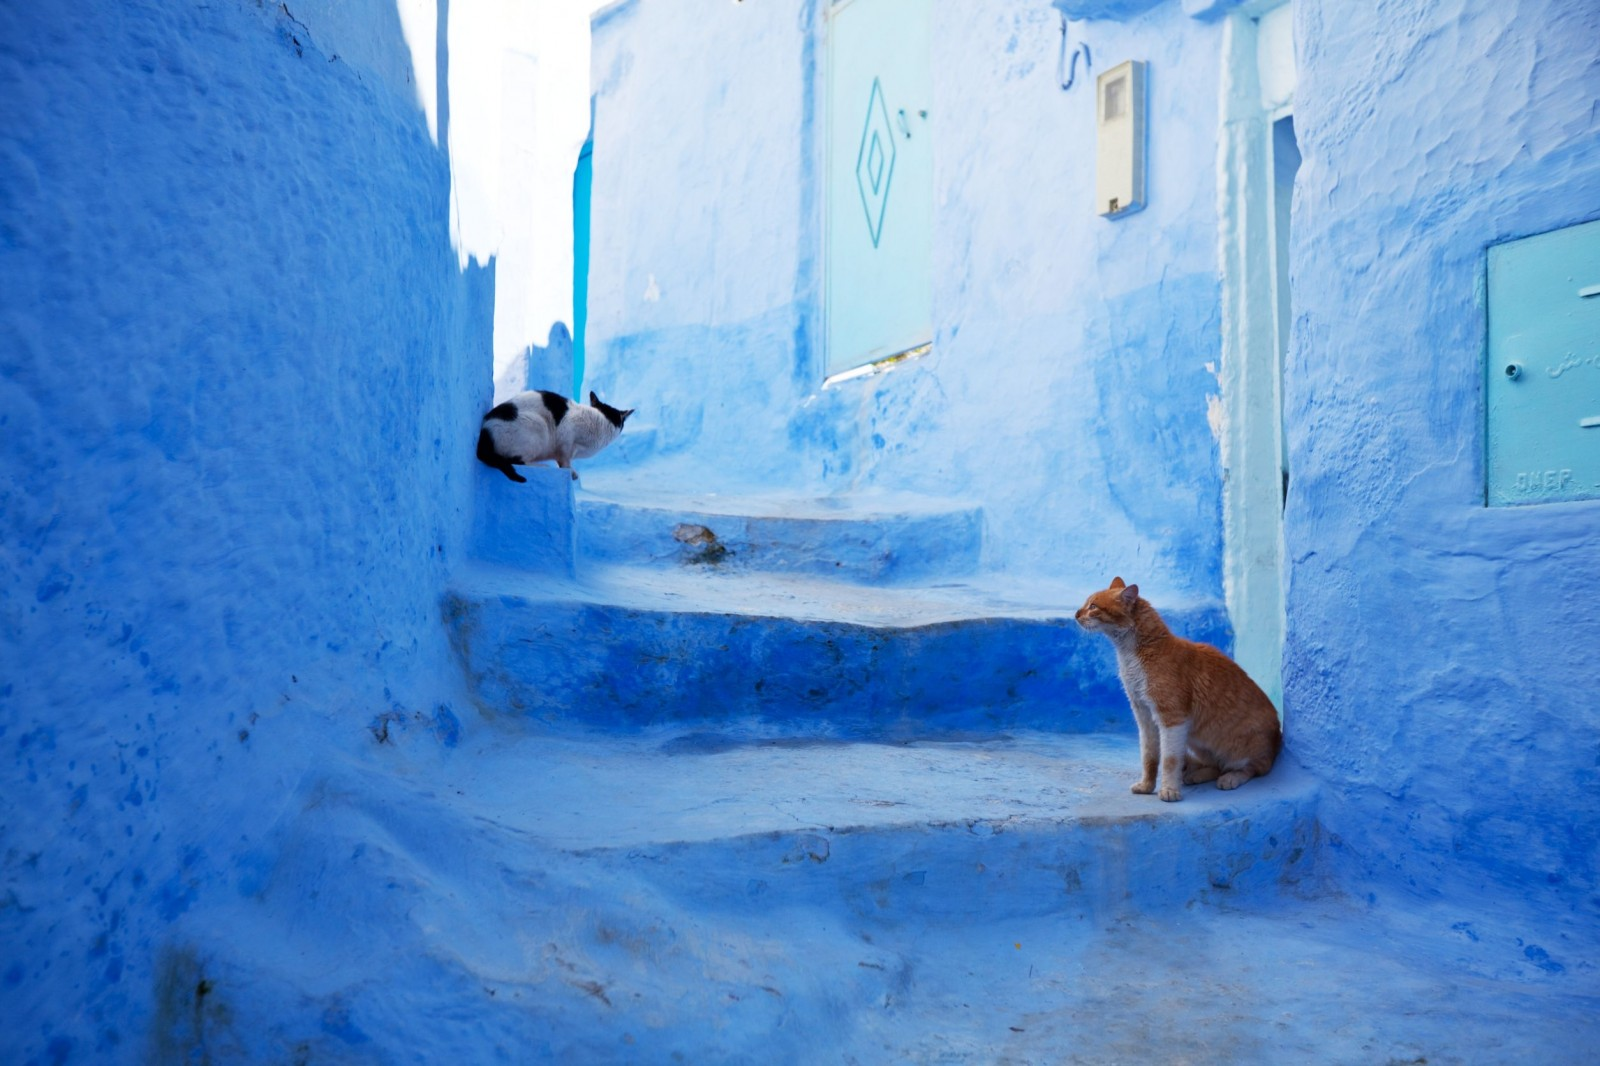 Cut Gloves For Kitchen Backsplash Wallpaper Chefchaouen The Blue City ~ Morocco Travel